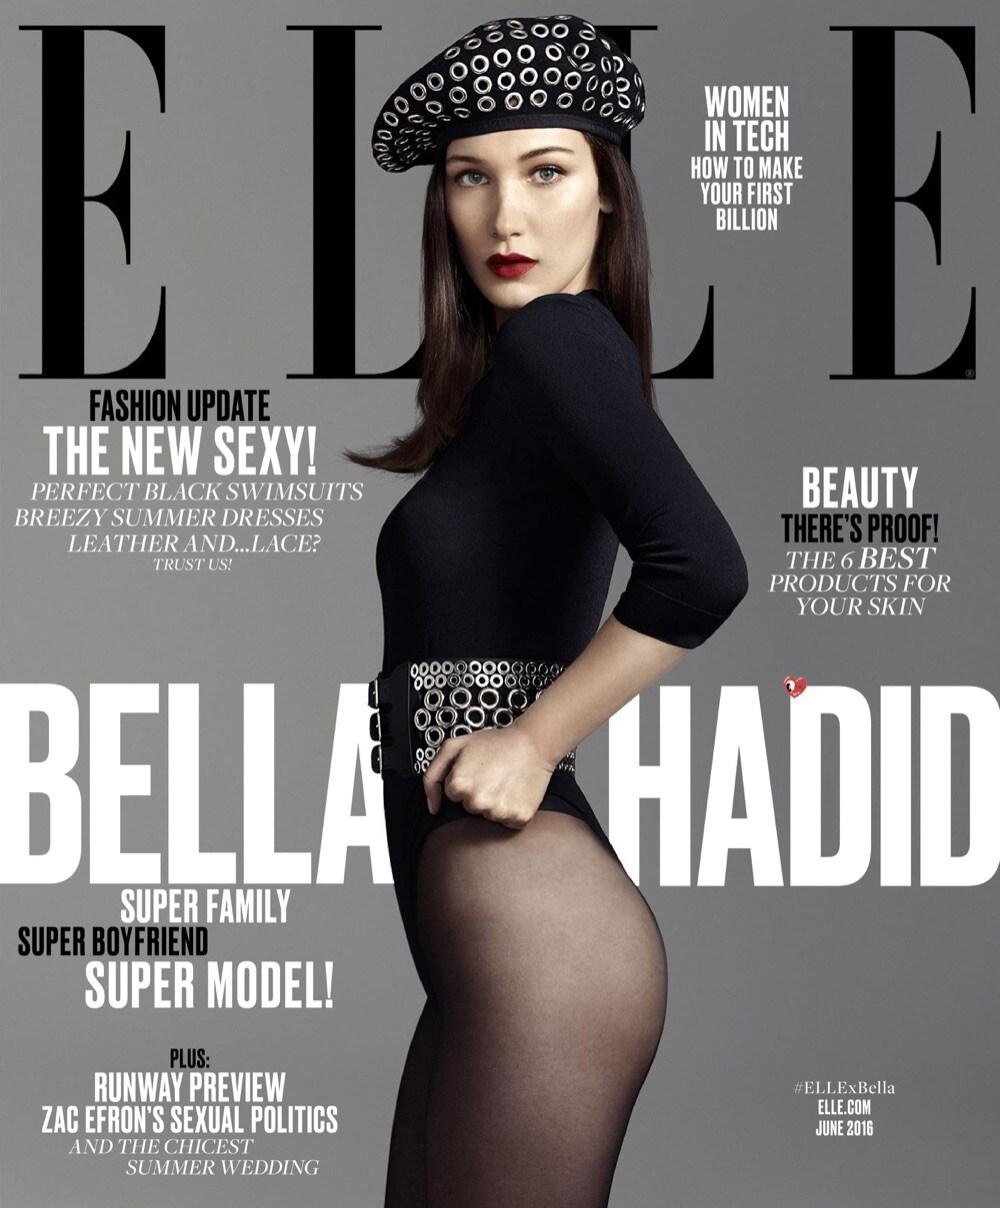 Bella-Hadid-for-Elle-U.S.-June-2016